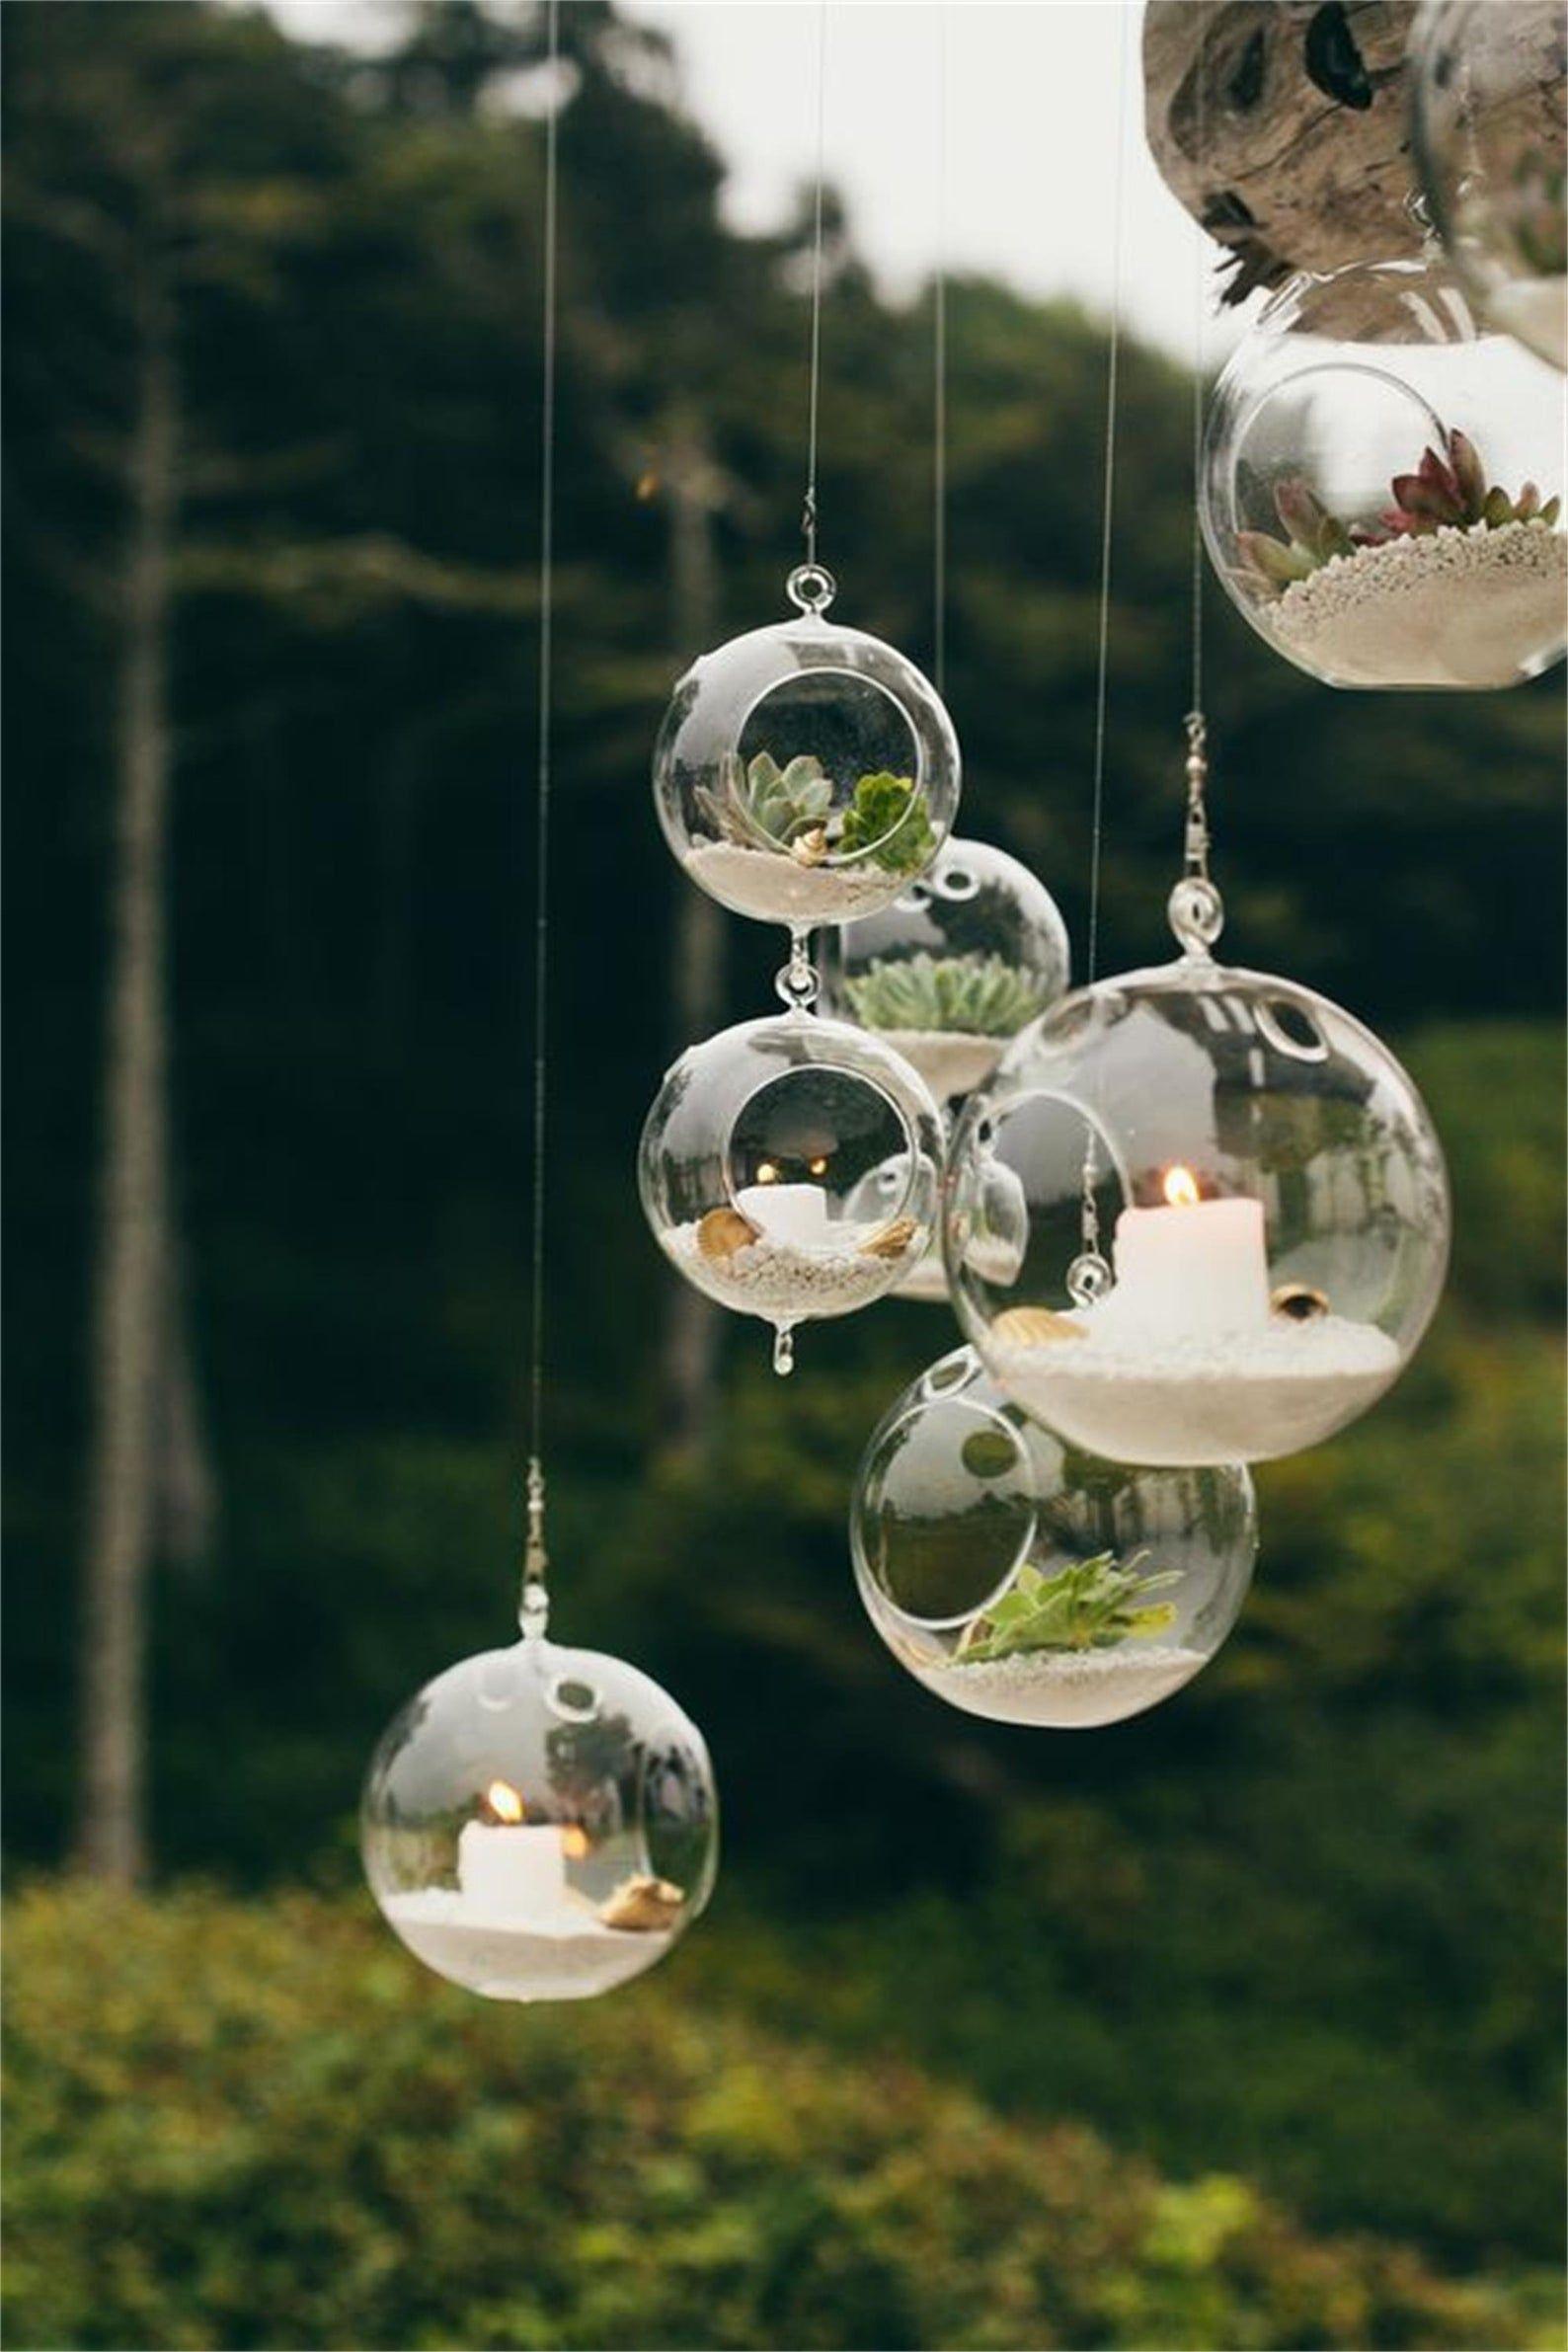 50 Pcs Glass Orbs 3 5 Wedding Hanging Candlestick Glass Etsy In 2020 Terrarium Wedding Geometric Terrarium Wedding Geometric Terrarium